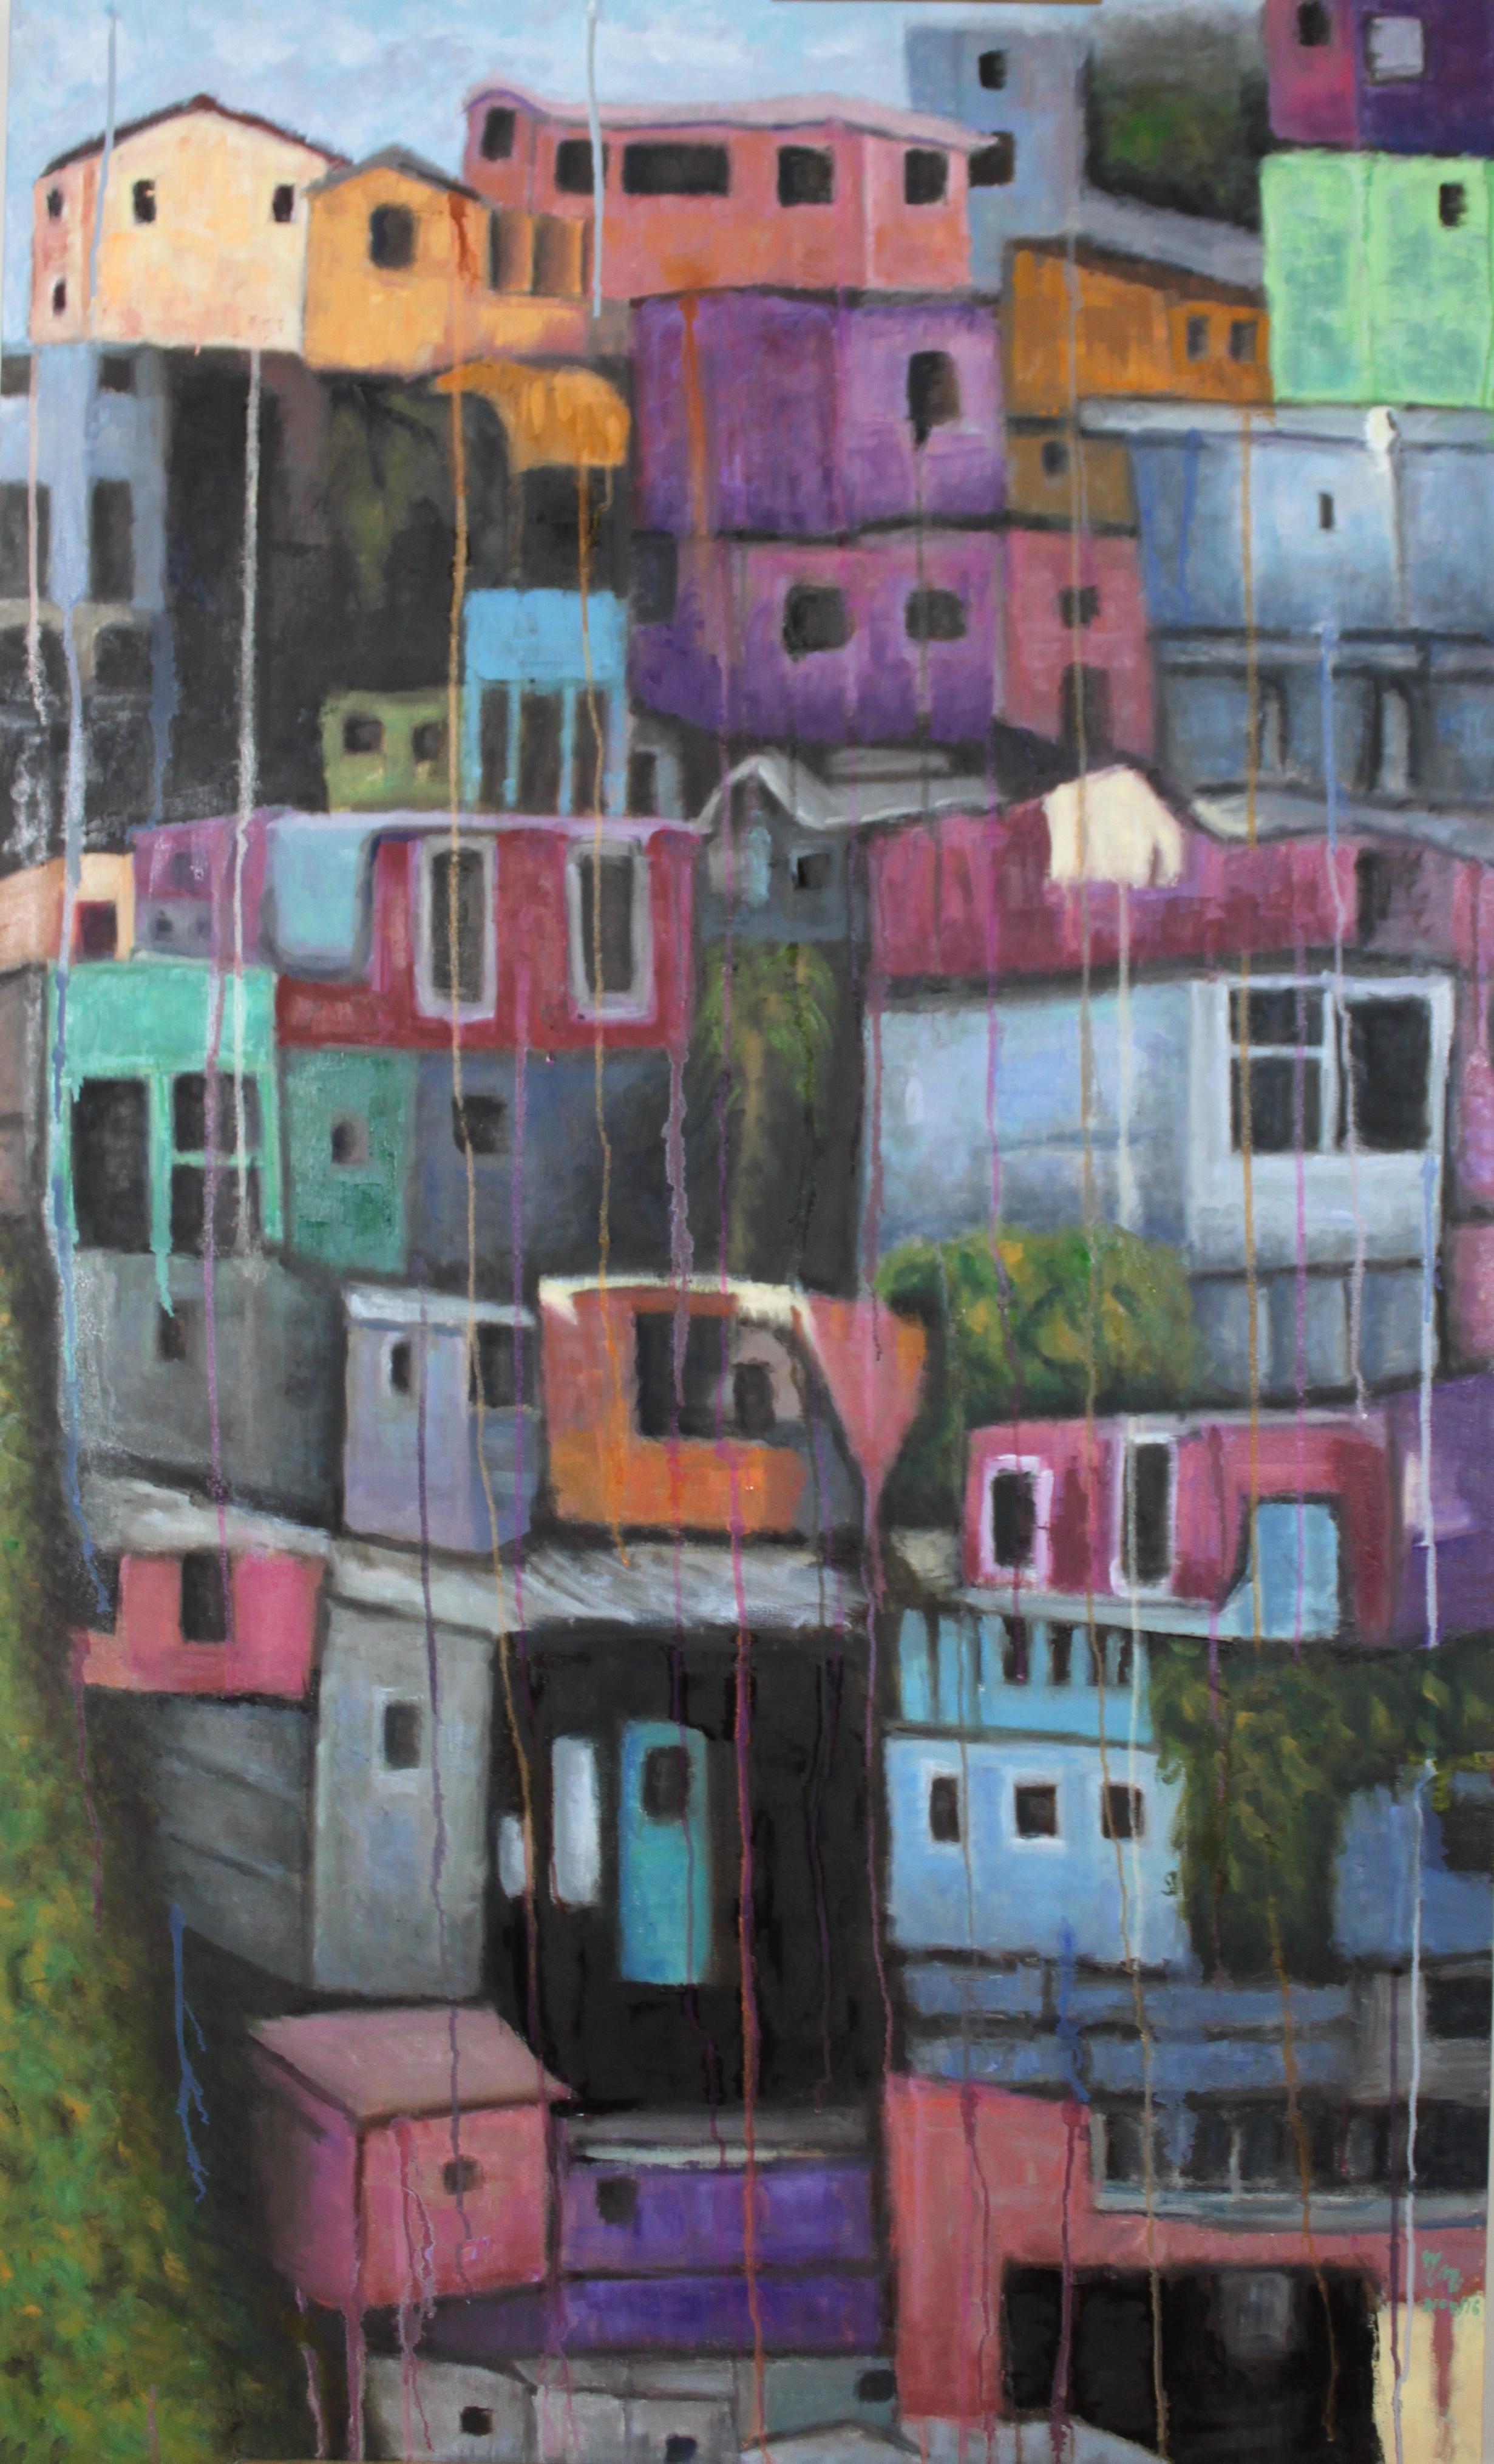 "Cara A Cara - 60"" x 36"" - Oil on canvas"